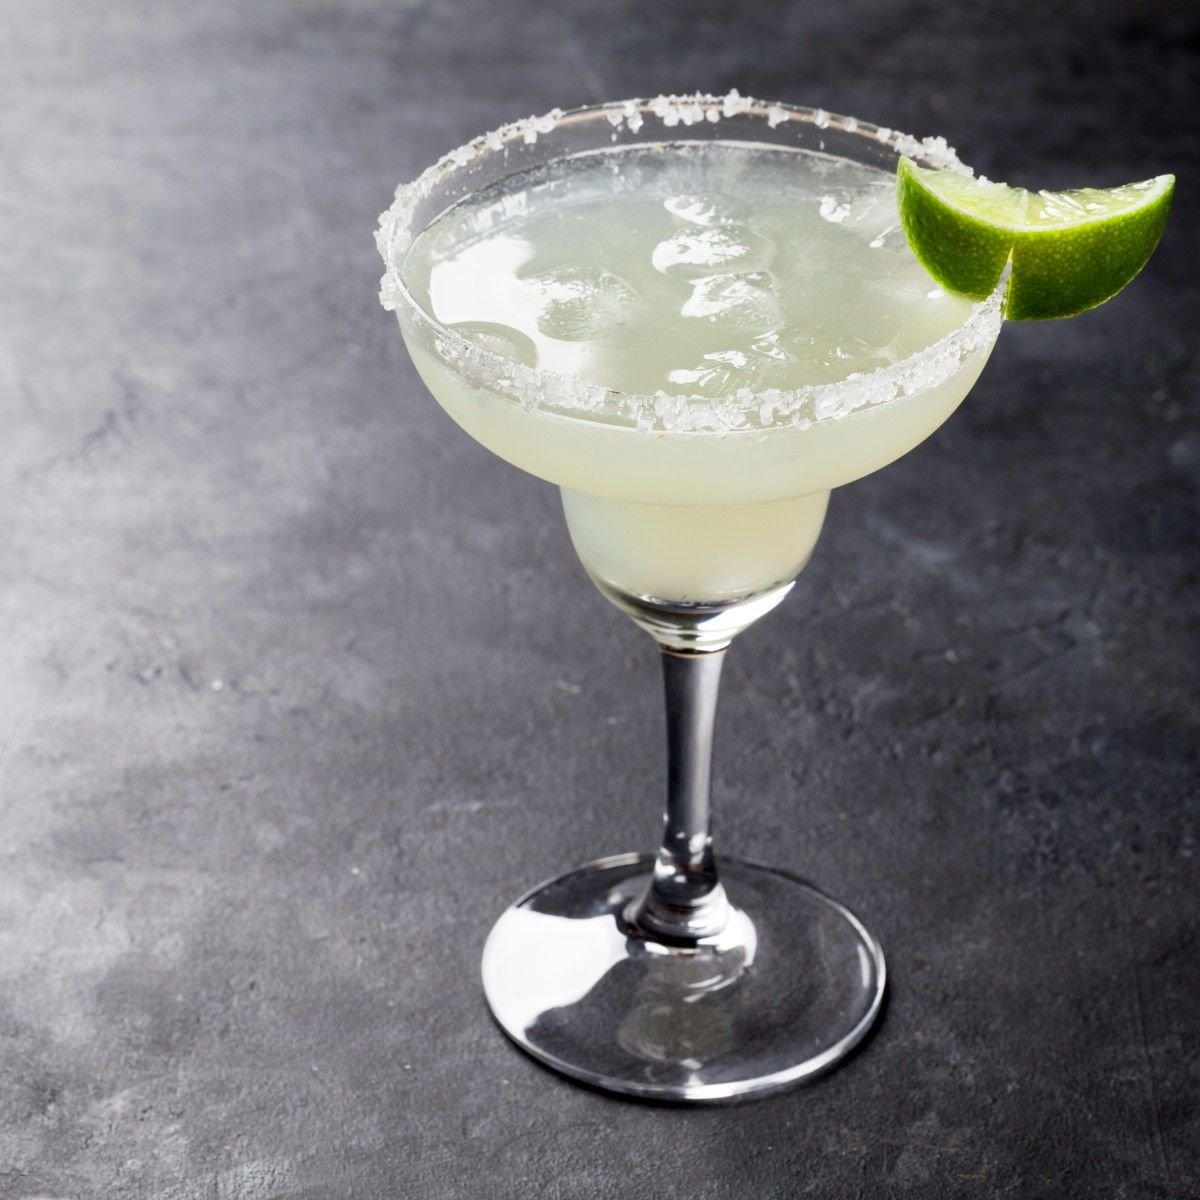 The Perfect Margarita, According To Rick Bayless